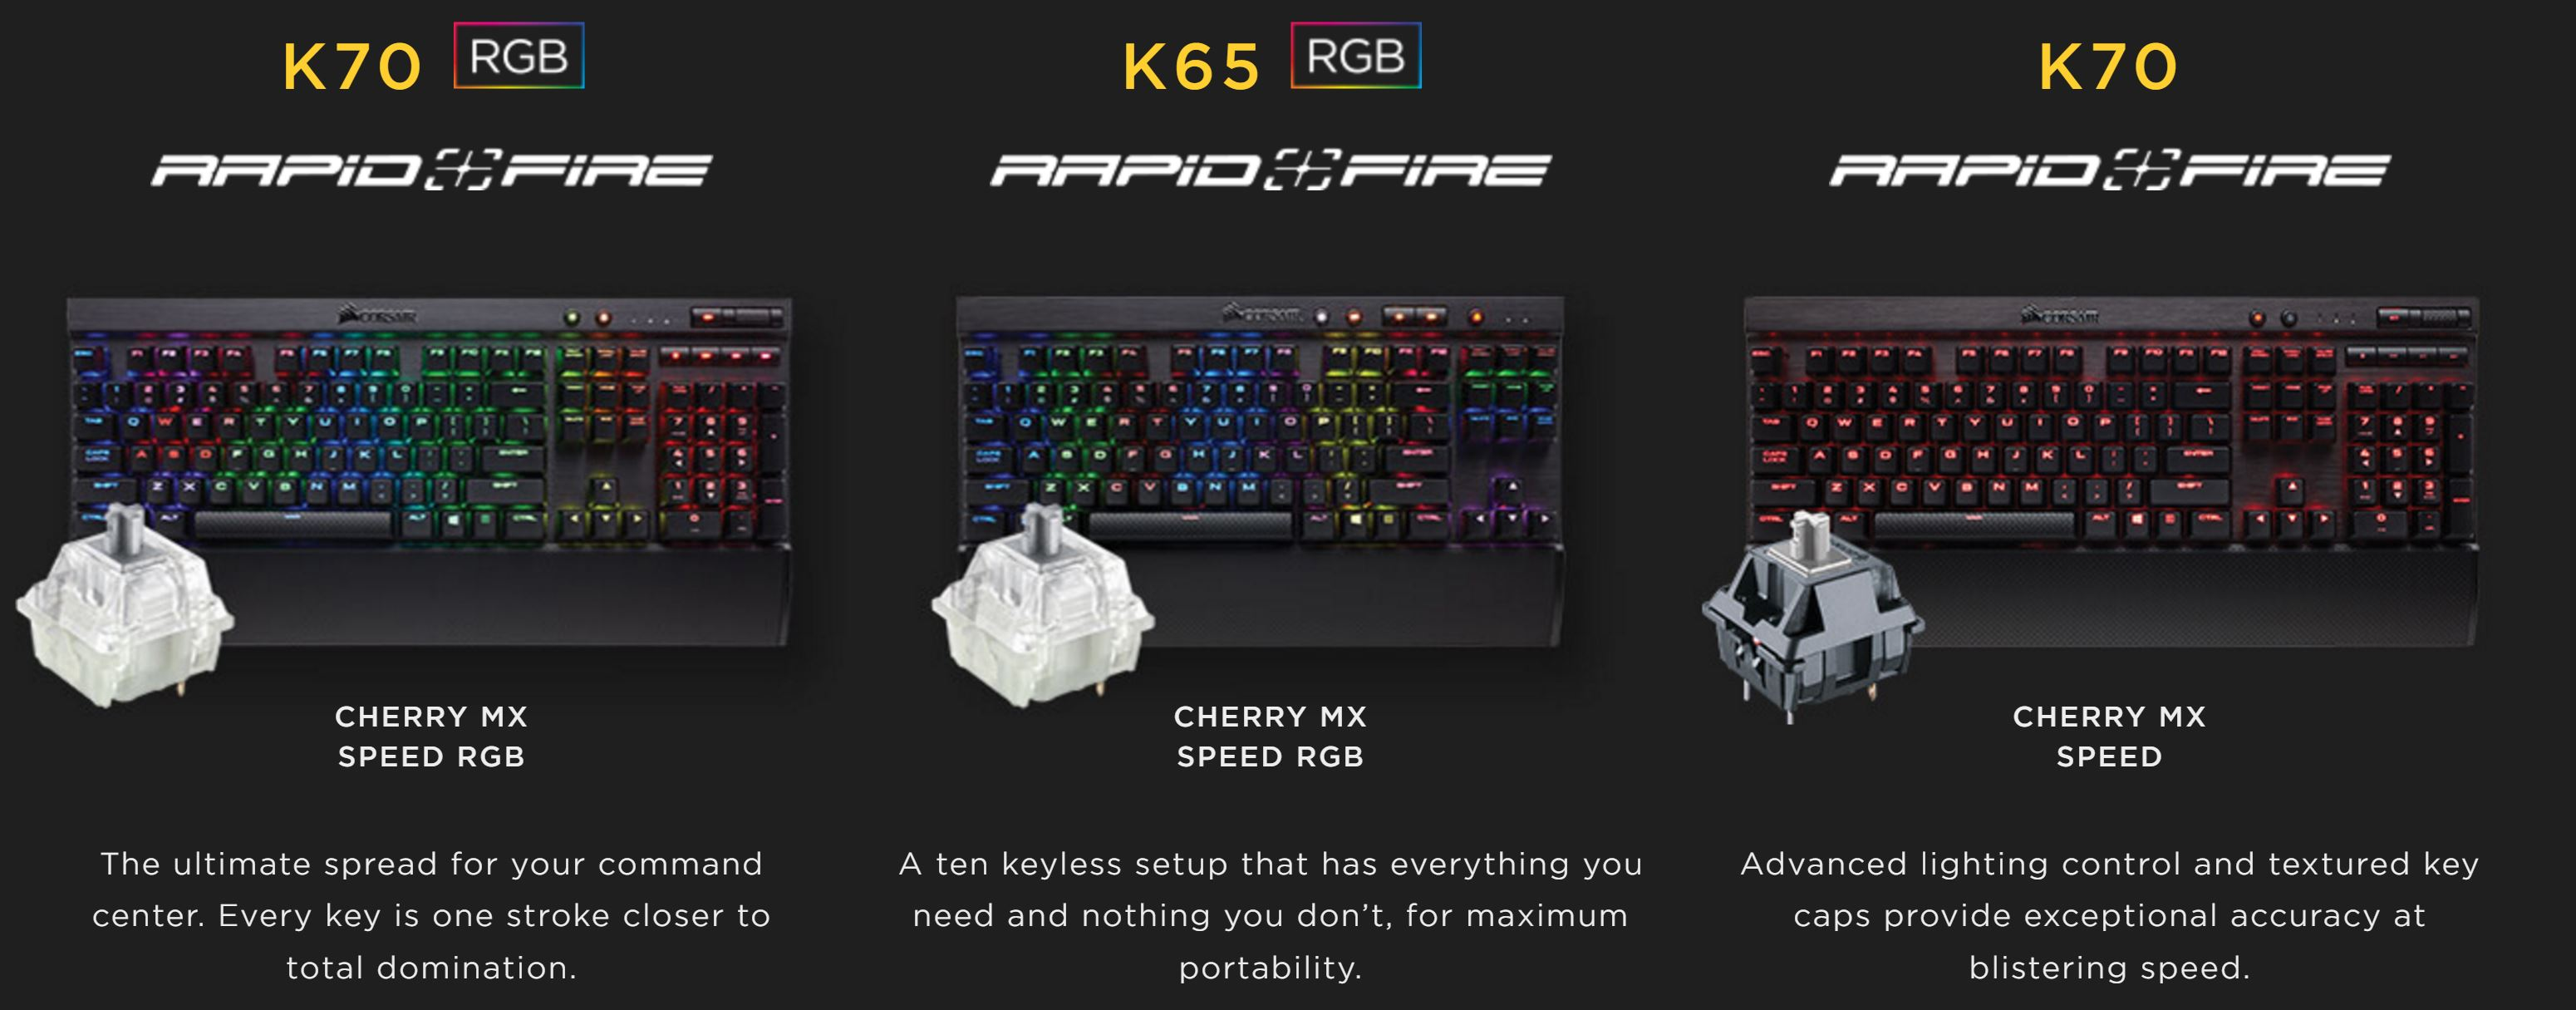 corsair k70 rgb price